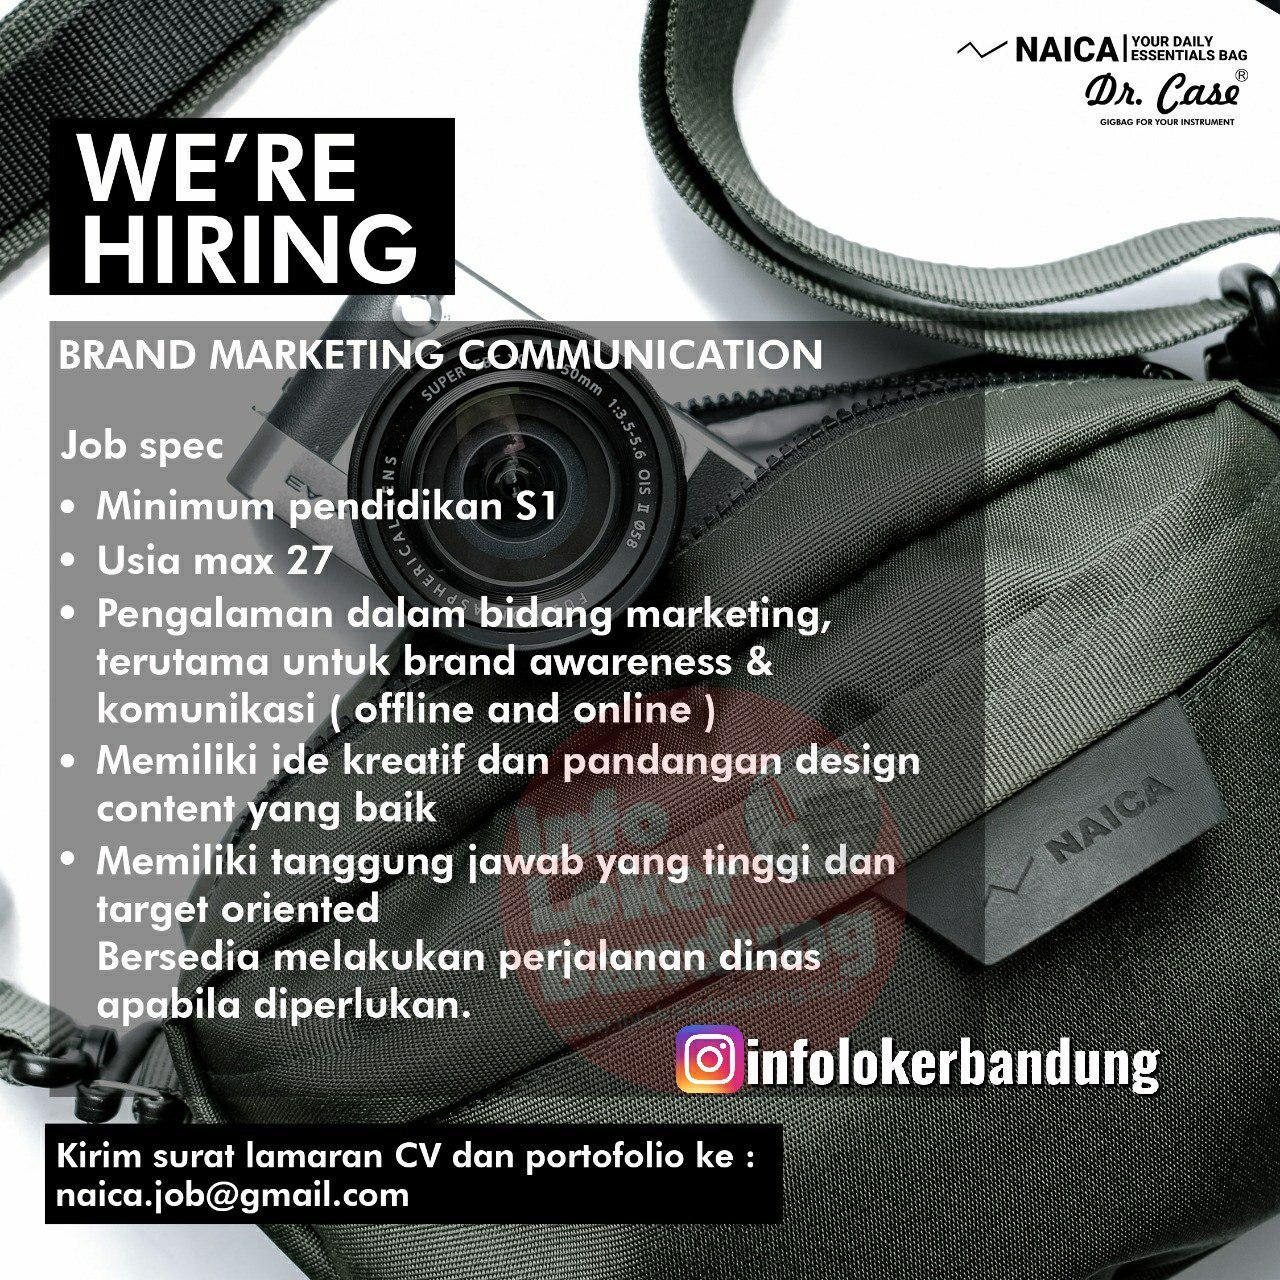 Lowongan Kerja Brand Marketing Communication Naica Bandung Oktober 2019